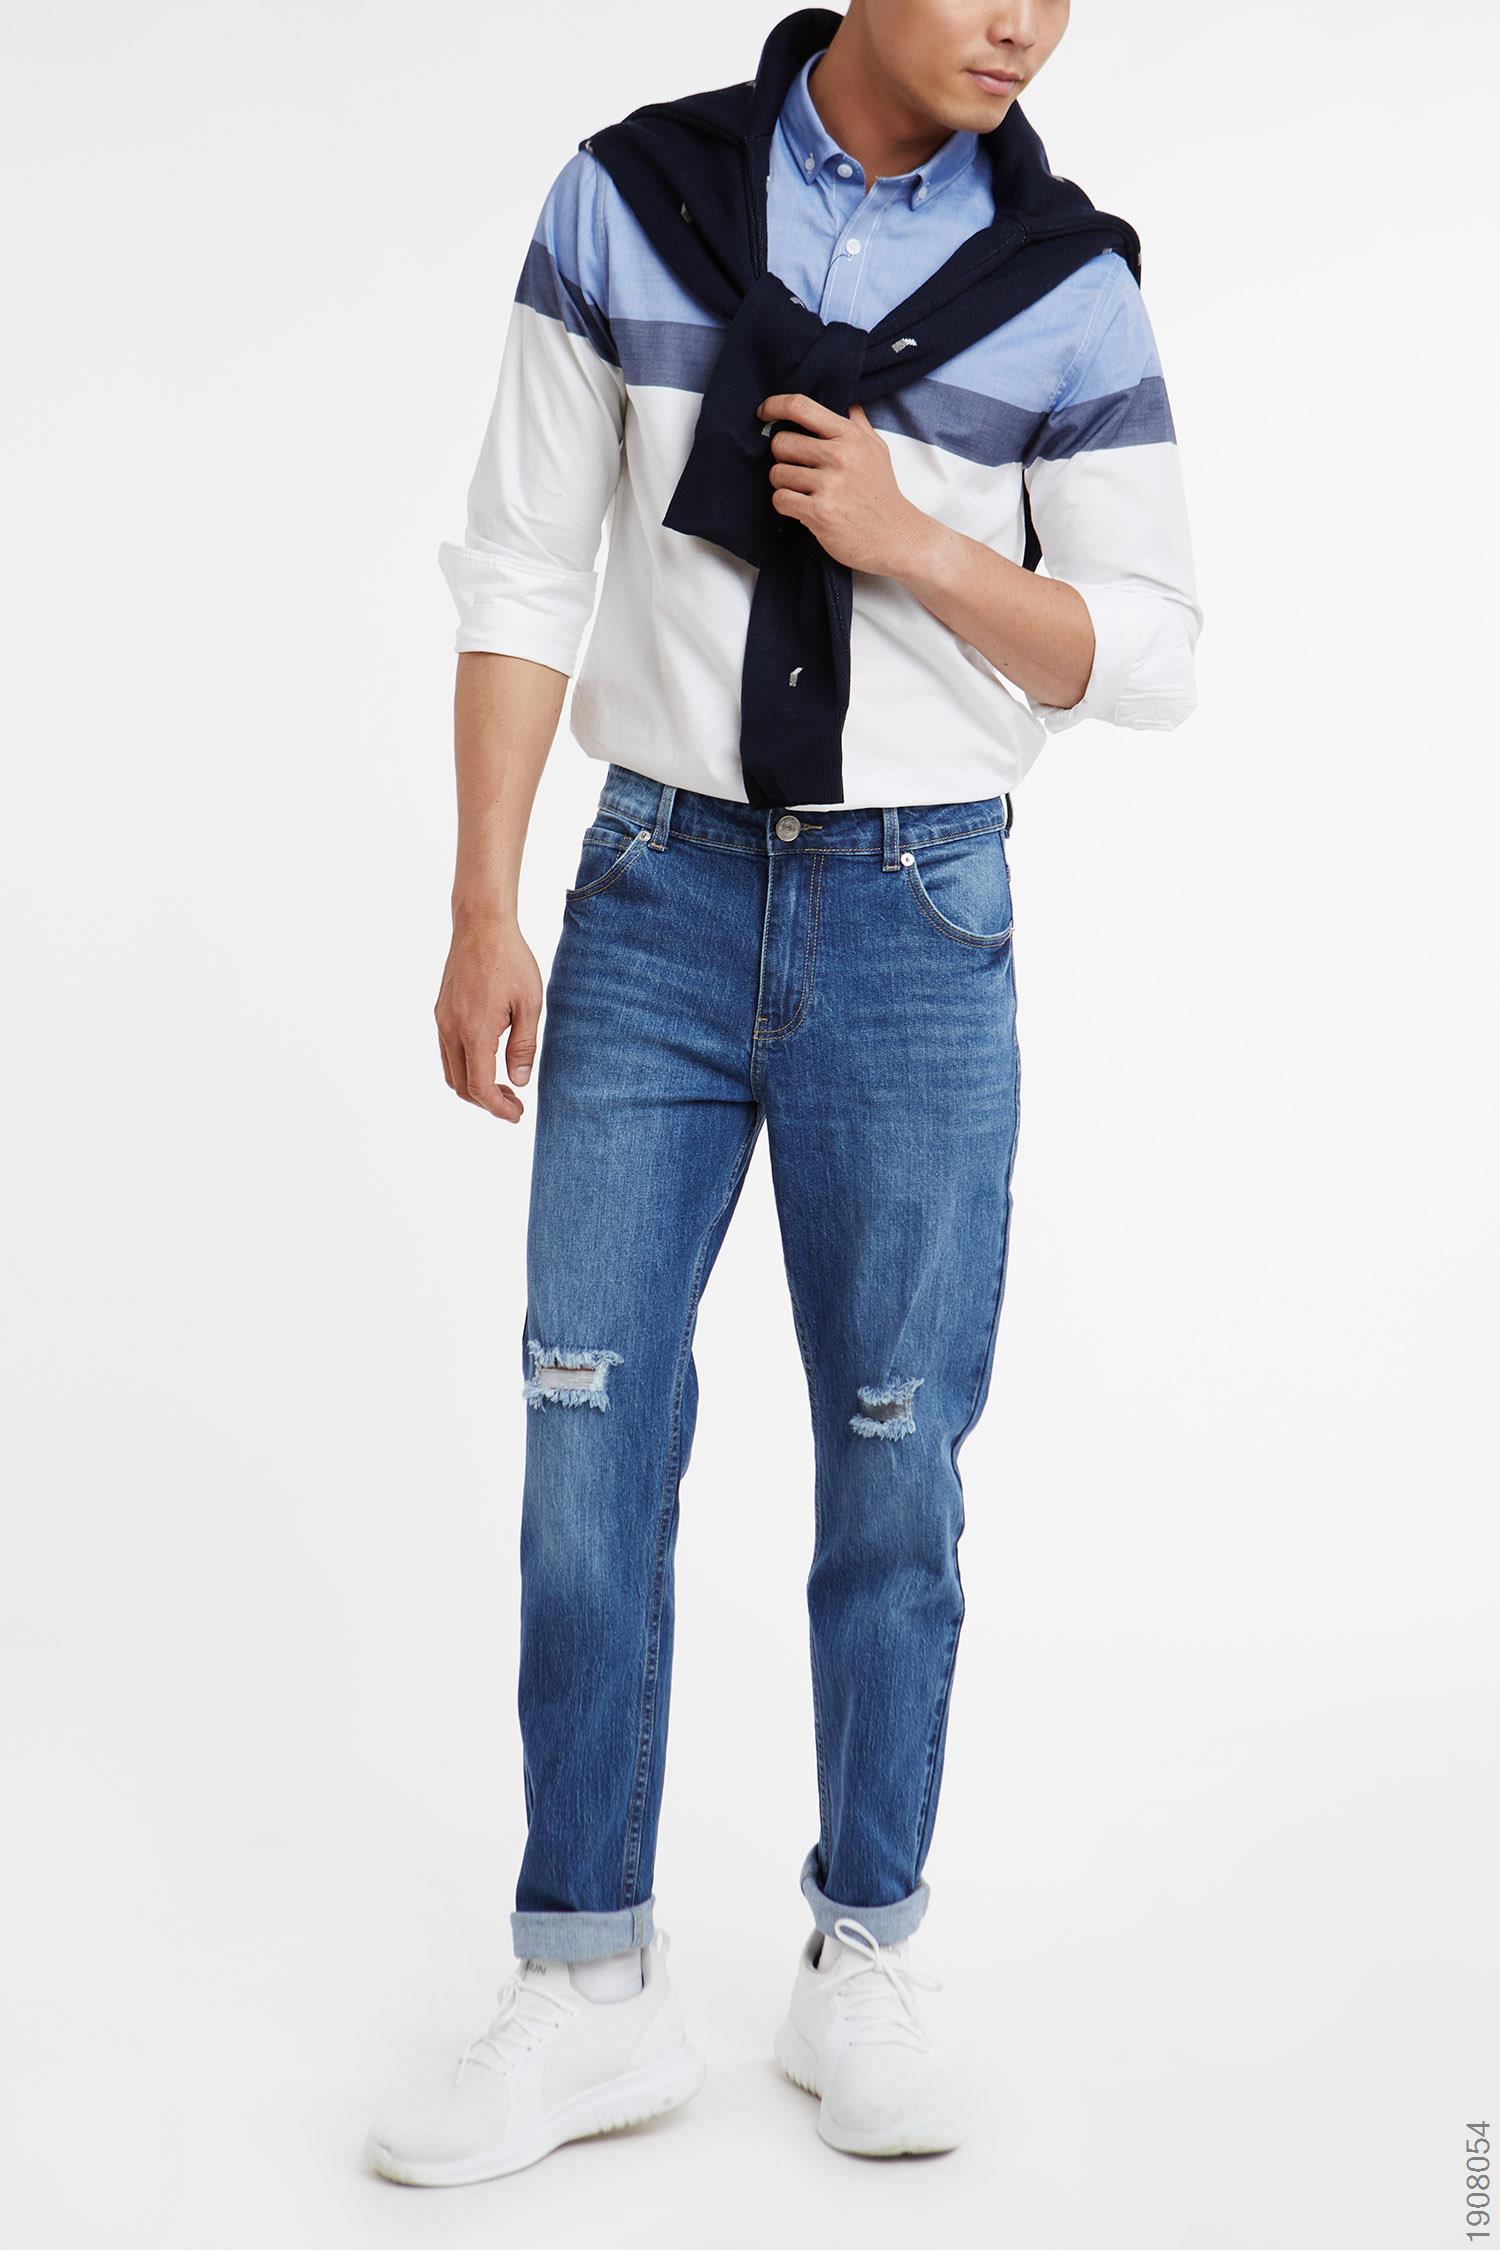 quần jean nam - 1908054